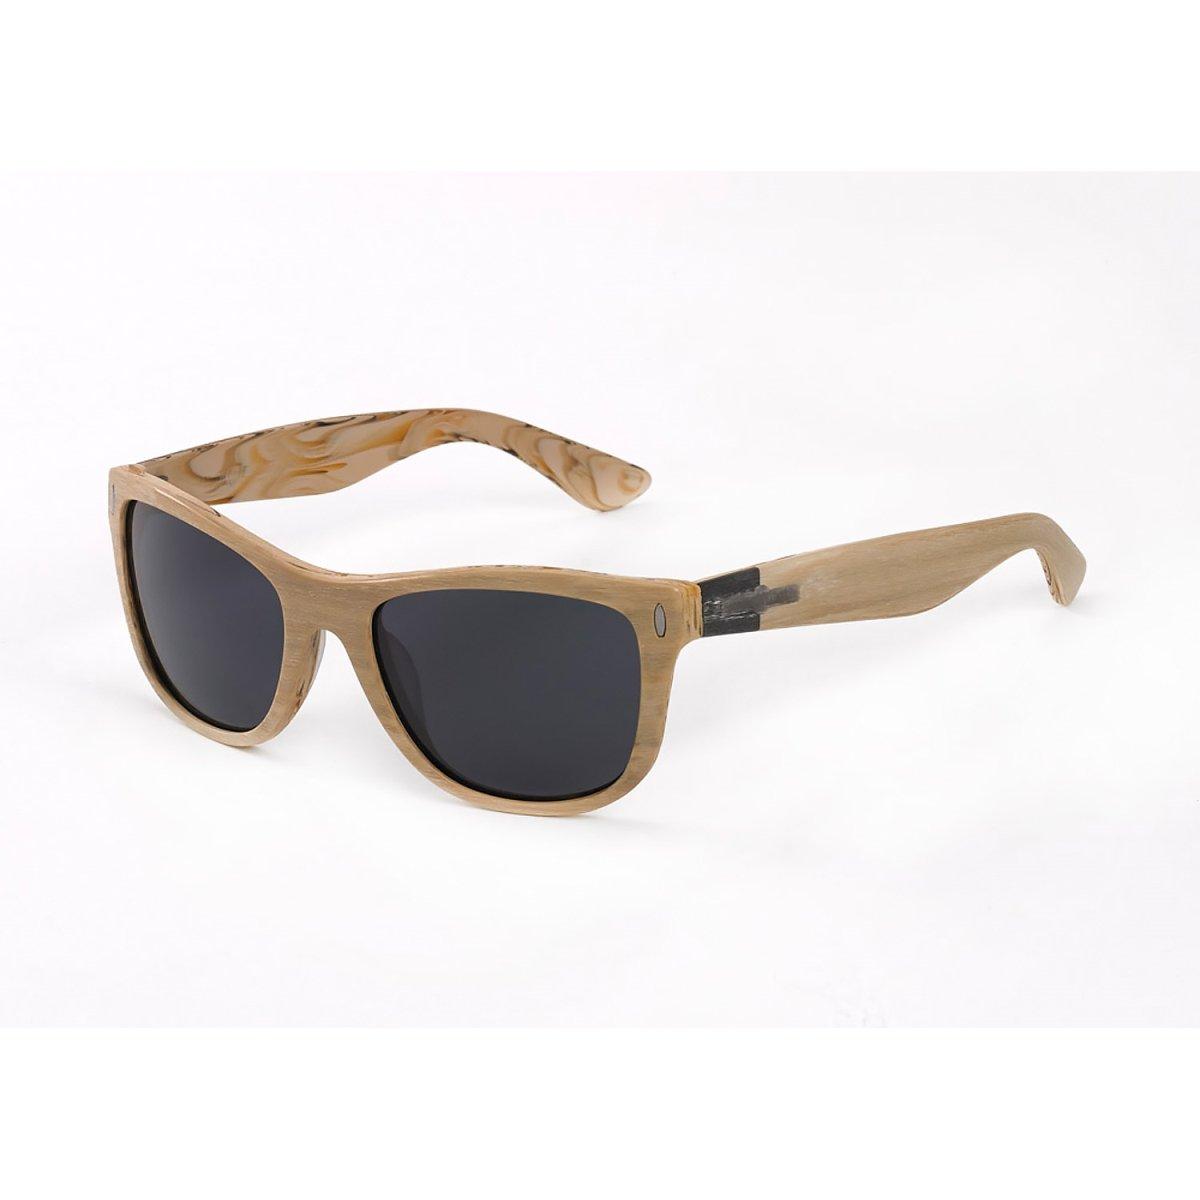 Hang Ten Gold The Wavefarer-Pine Wood/Smoke Lens